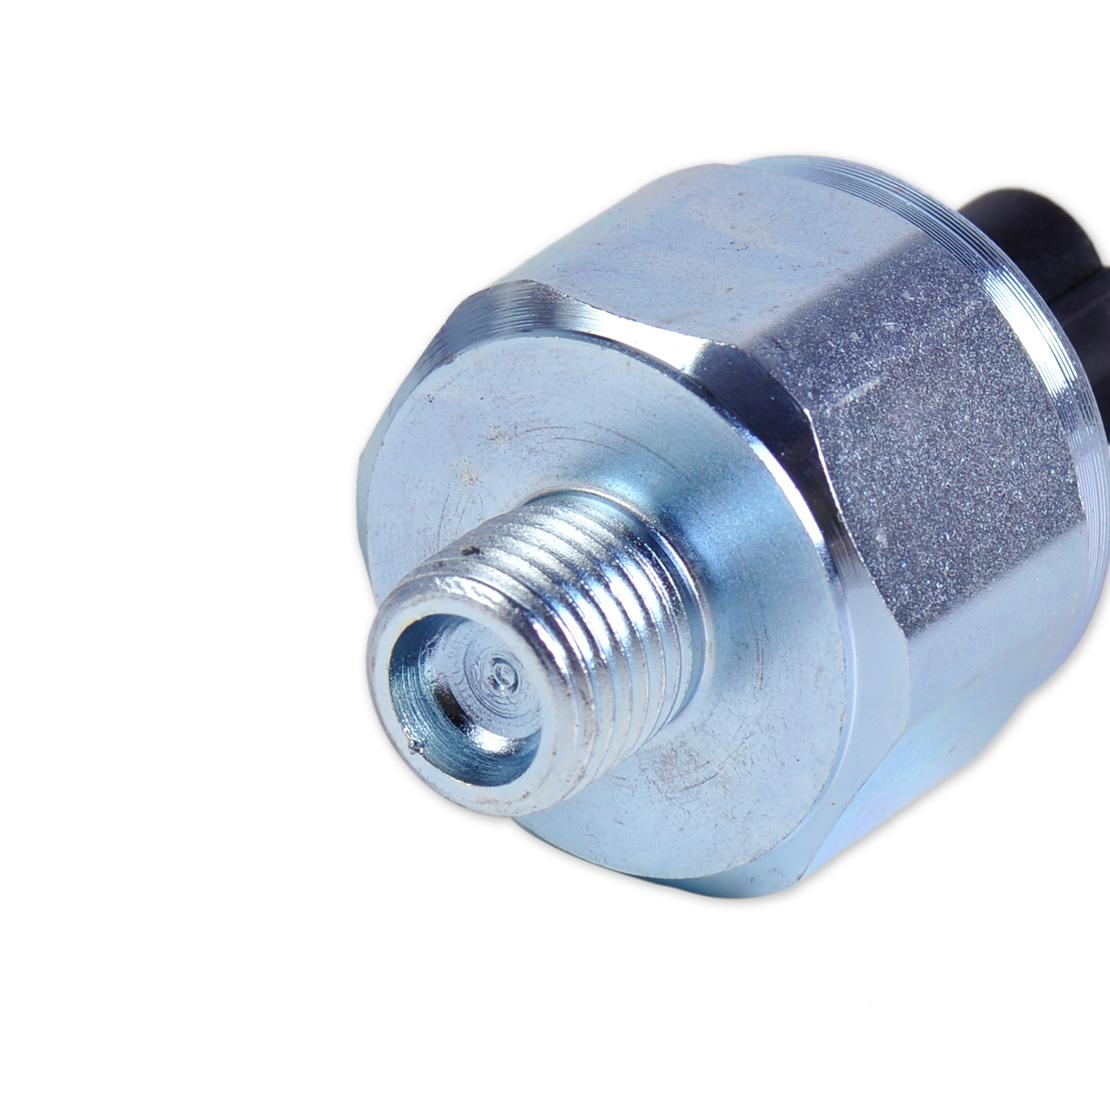 Knock Sensor Fit For Honda Accord Civic Element 30530-PPL